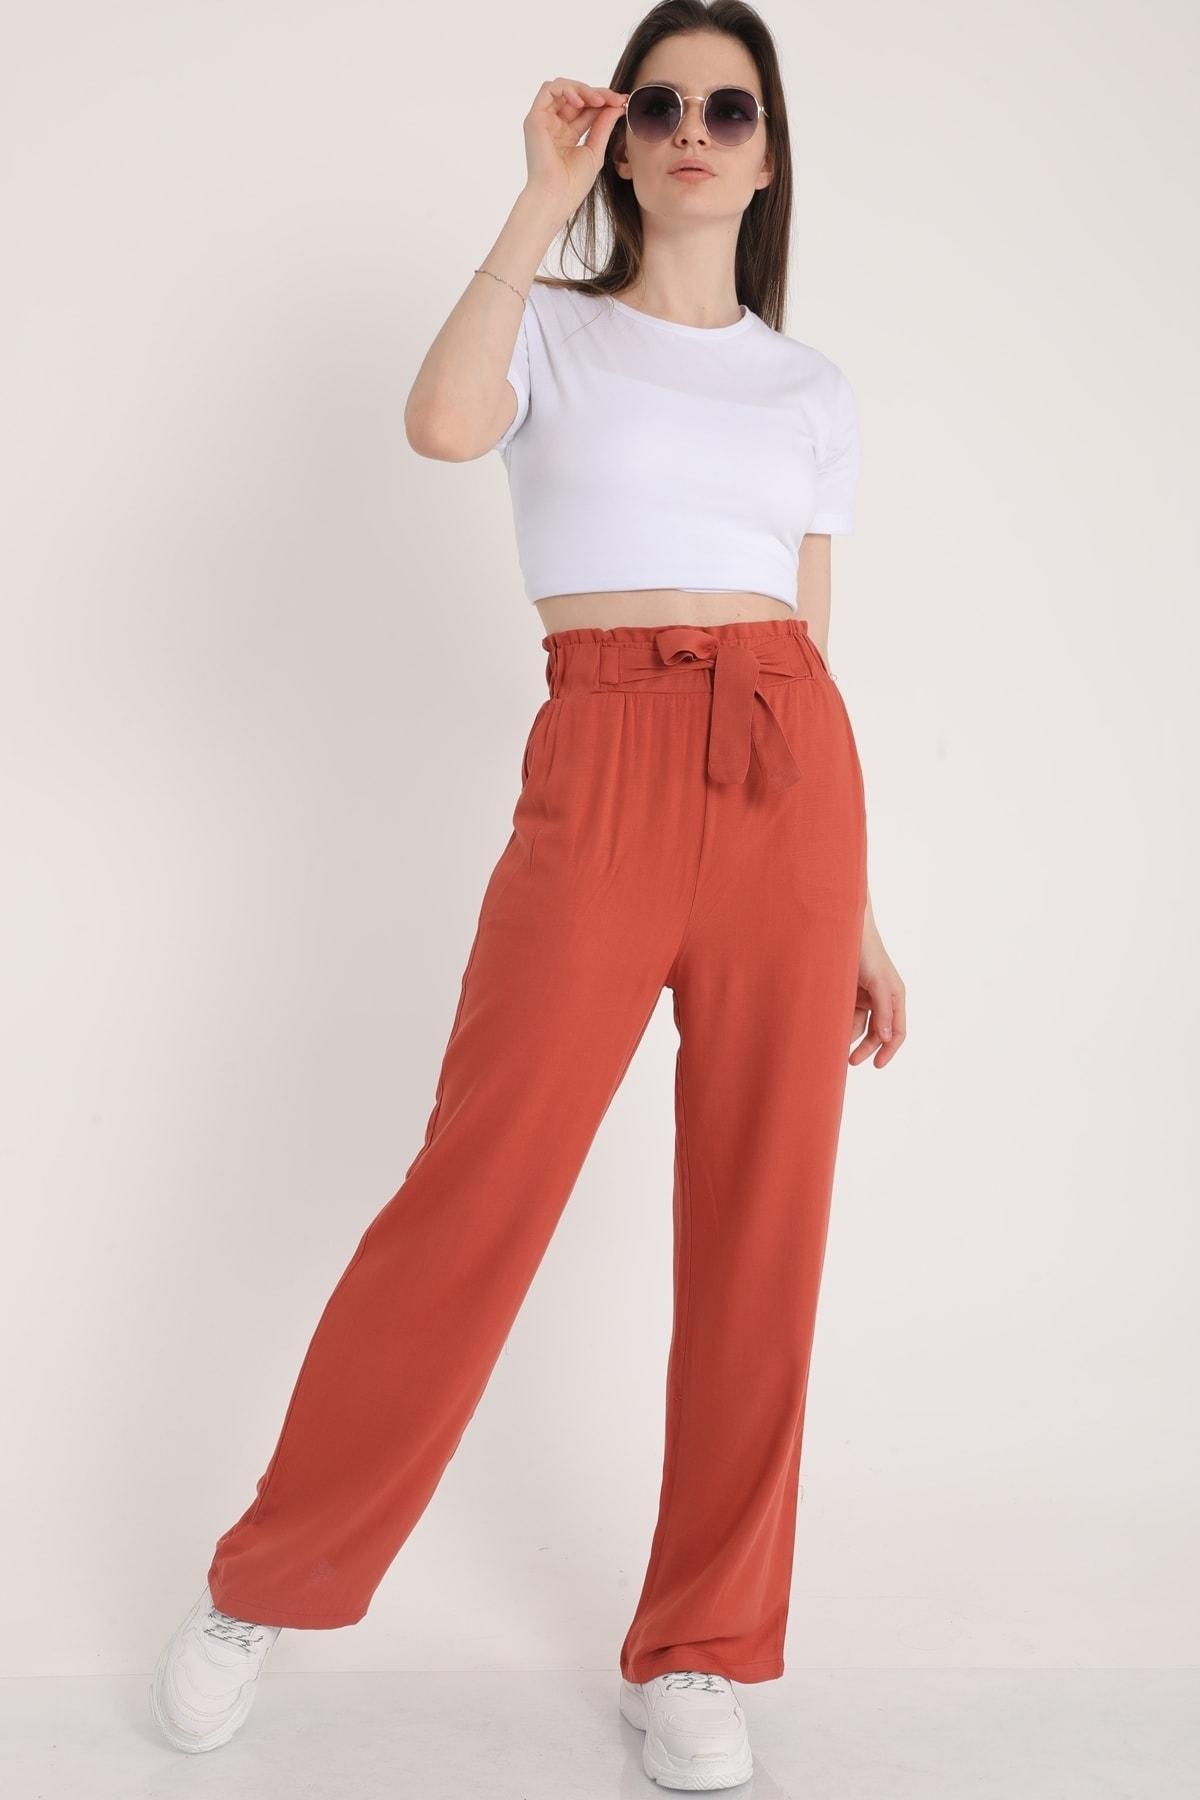 MD trend Kadın Gül Kurusu Bel Lastikli Kemerli Salaş Pantolon  Mdt5181 1